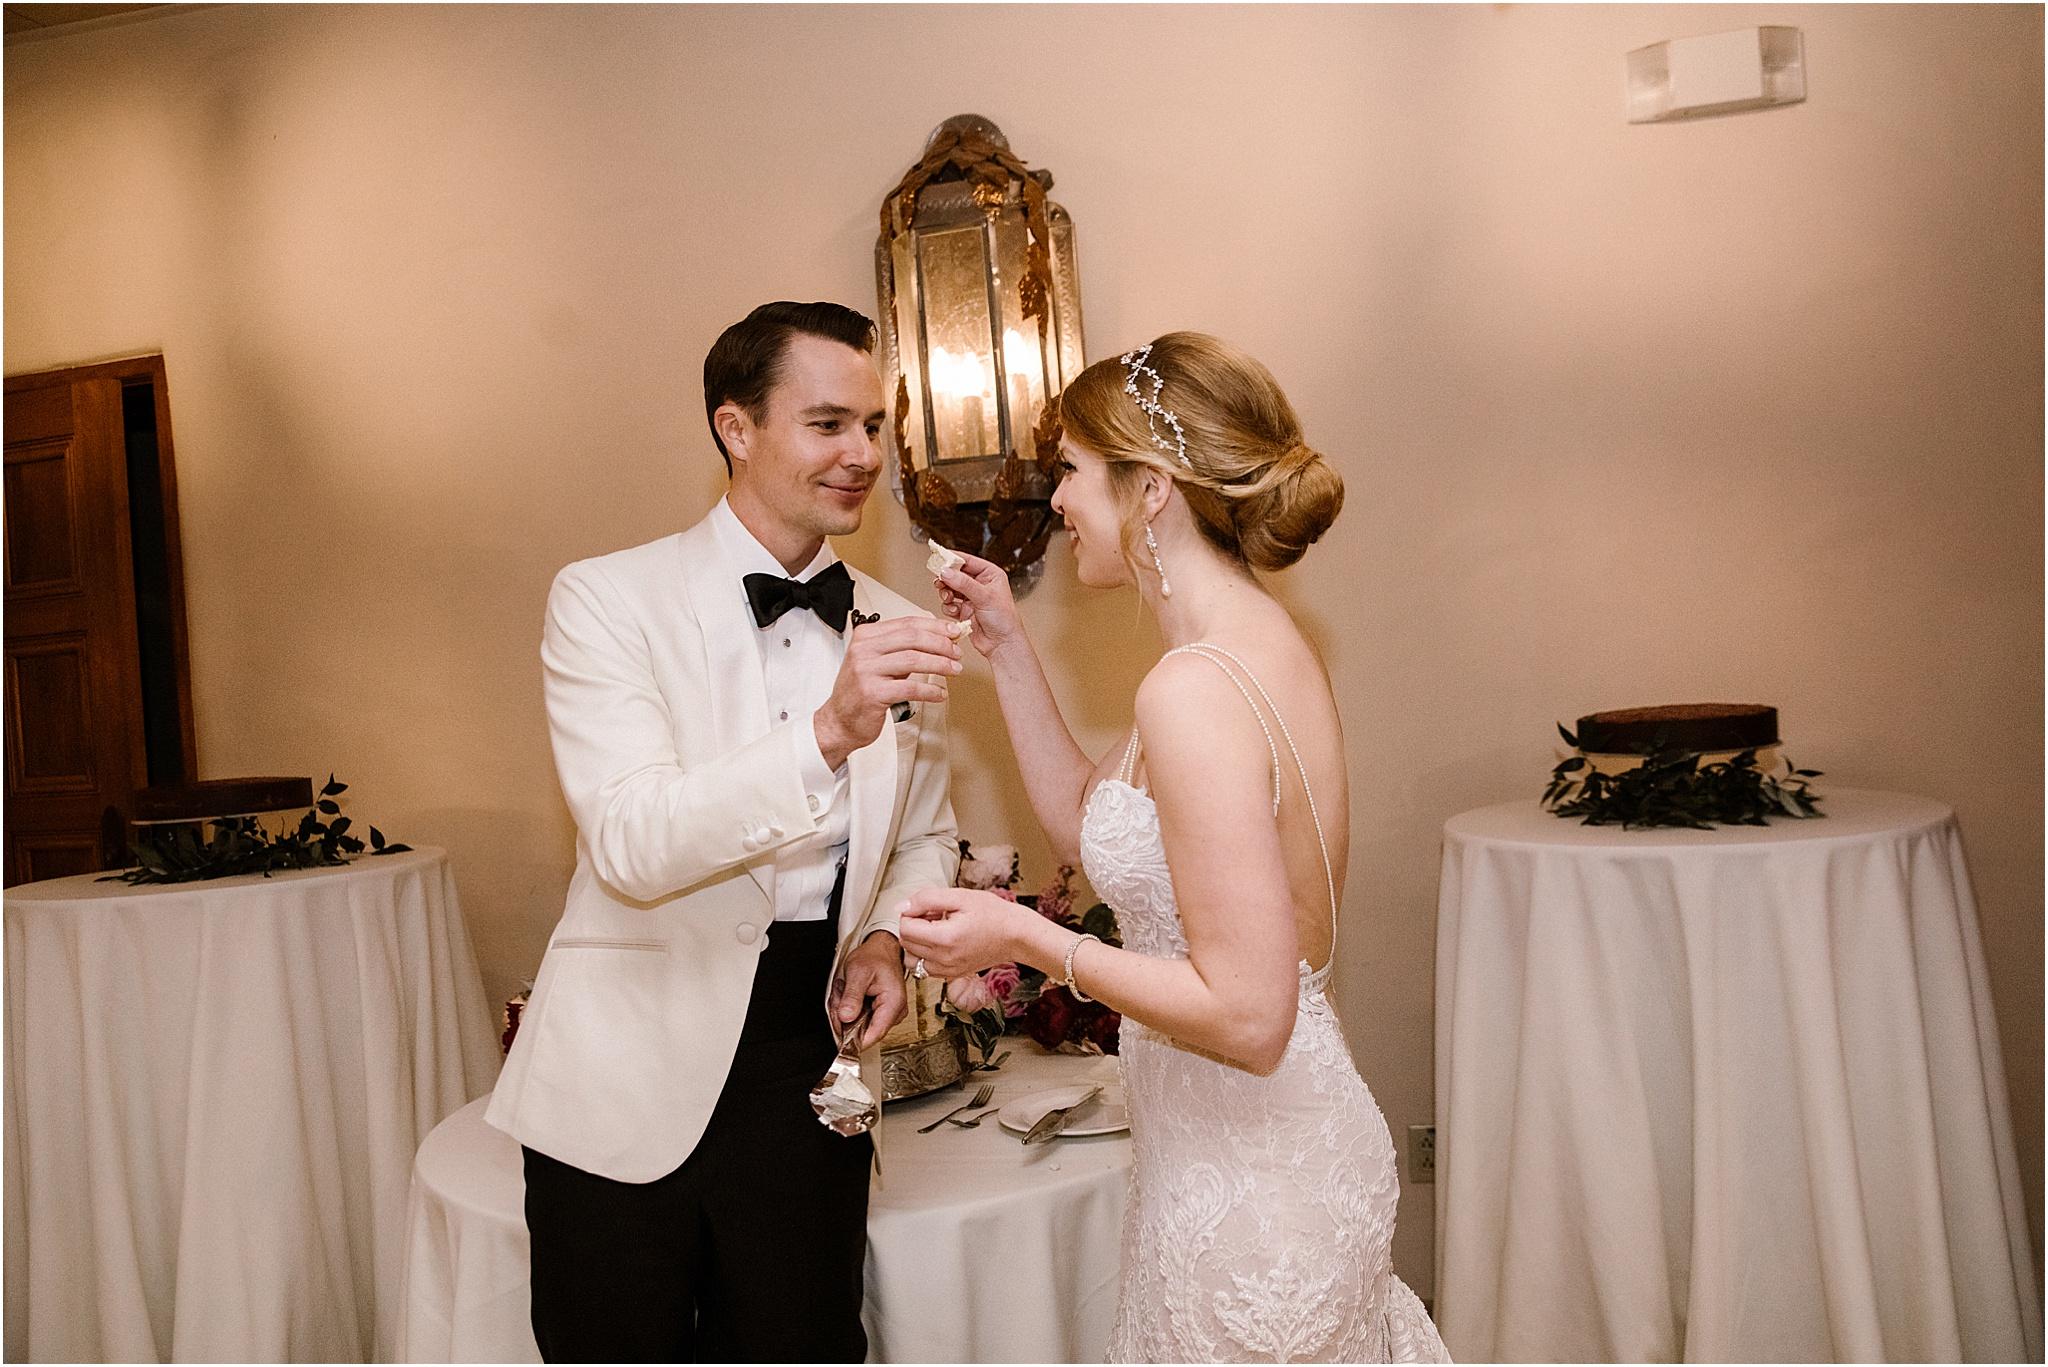 BLUE ROSE PHOTOGRAPHY SANTA FE WEDDING_61